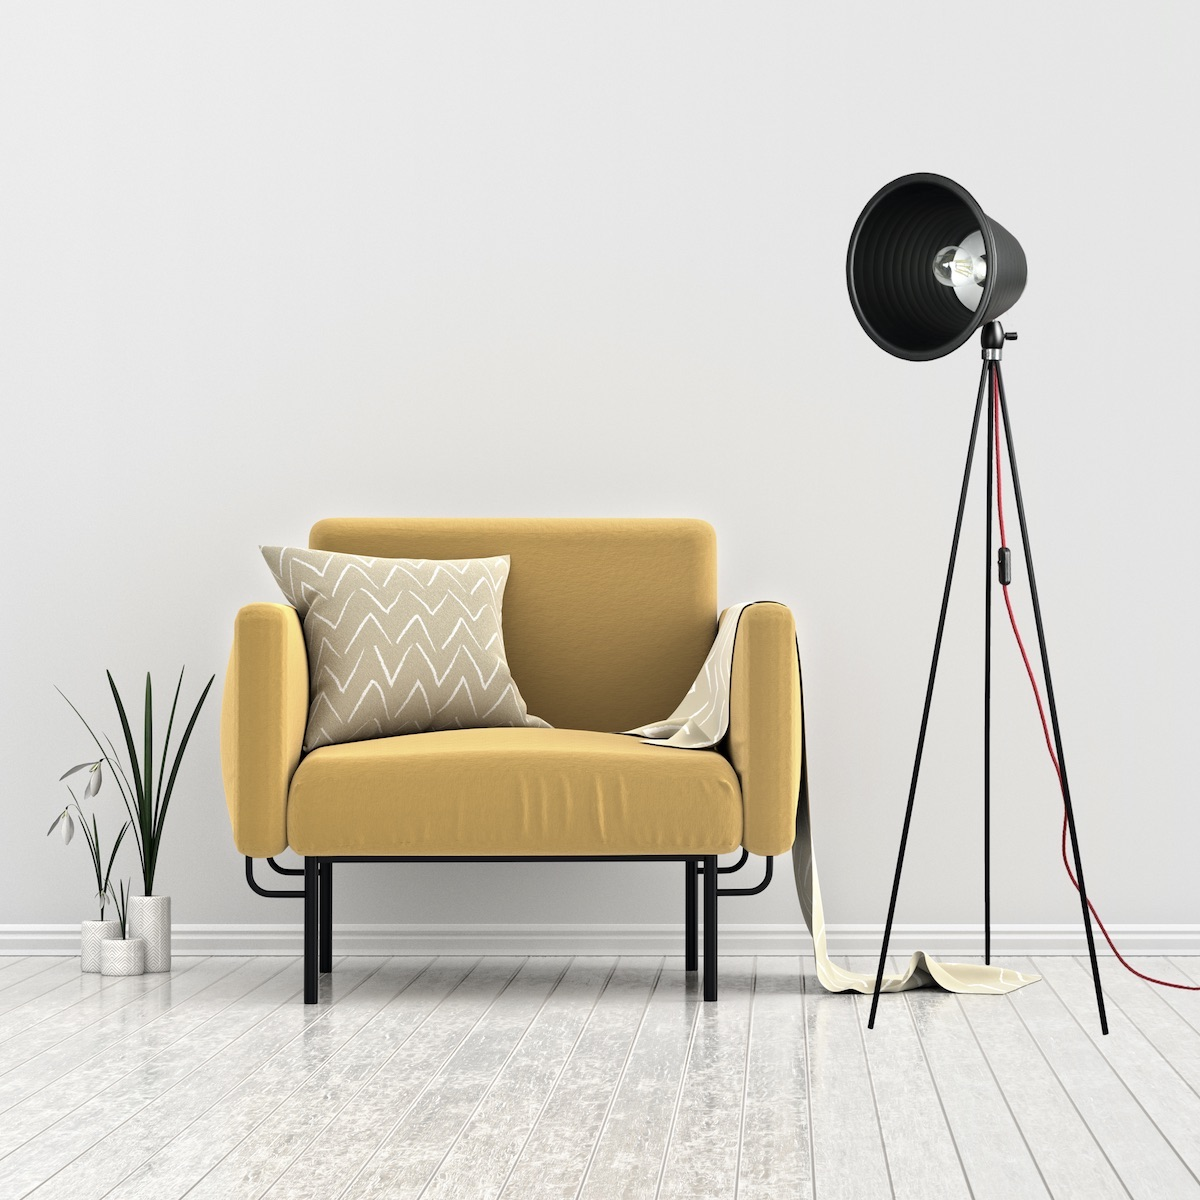 stojaci-lampa-taboo-cerna-vedle-kresla-design